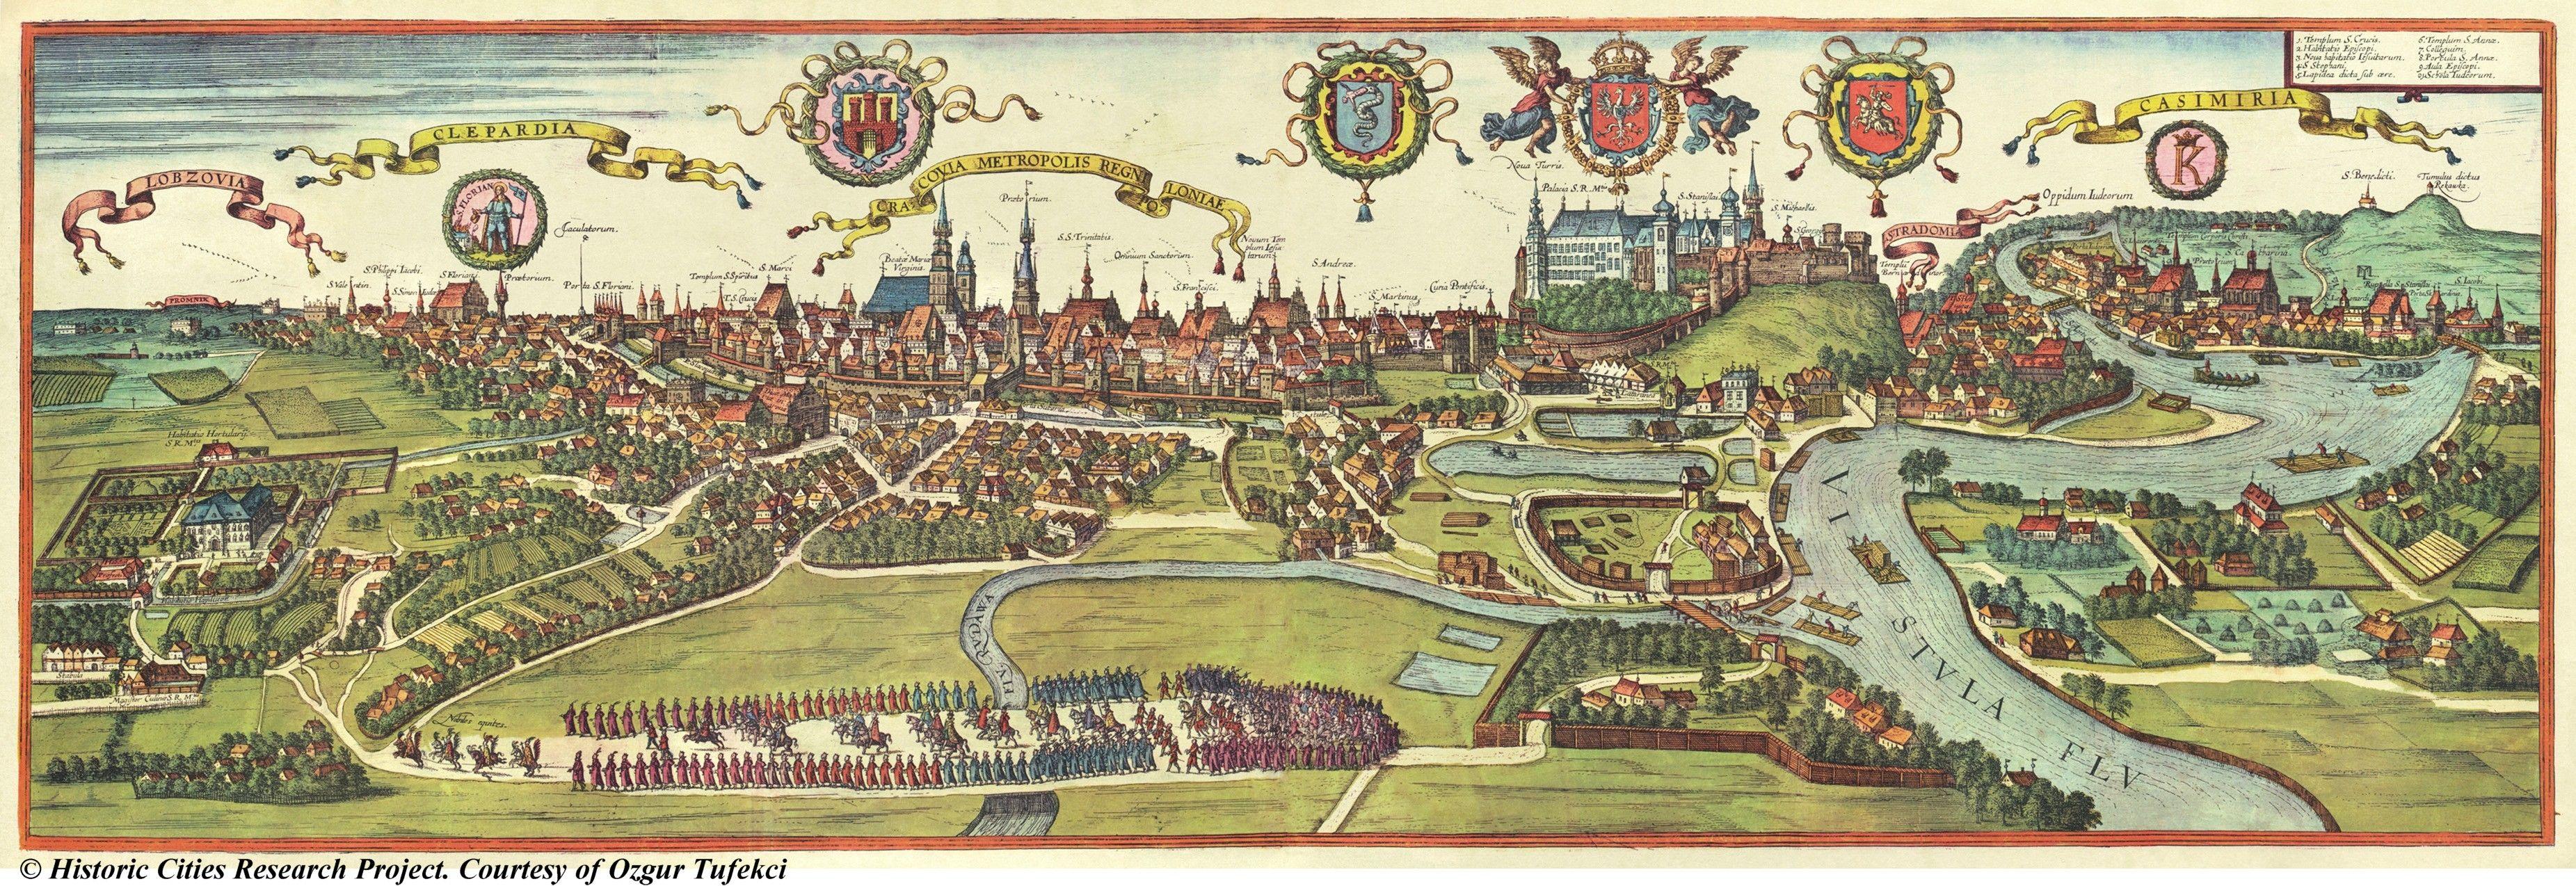 Krakow Anno 1617